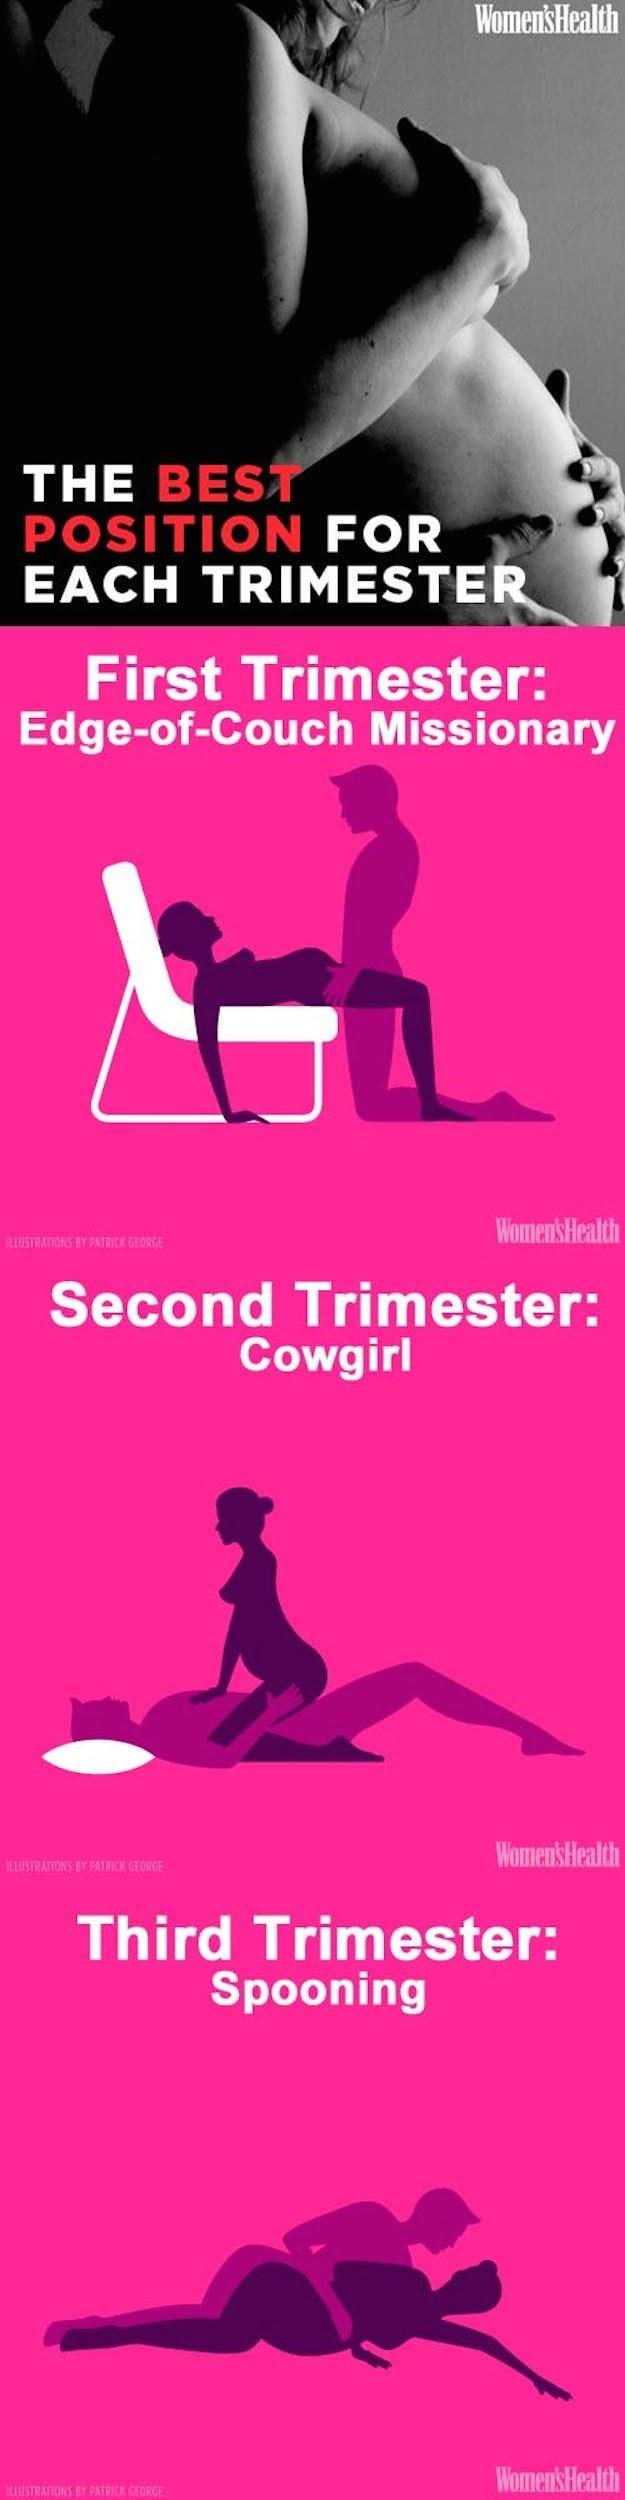 Tips for having sex during pregnancy